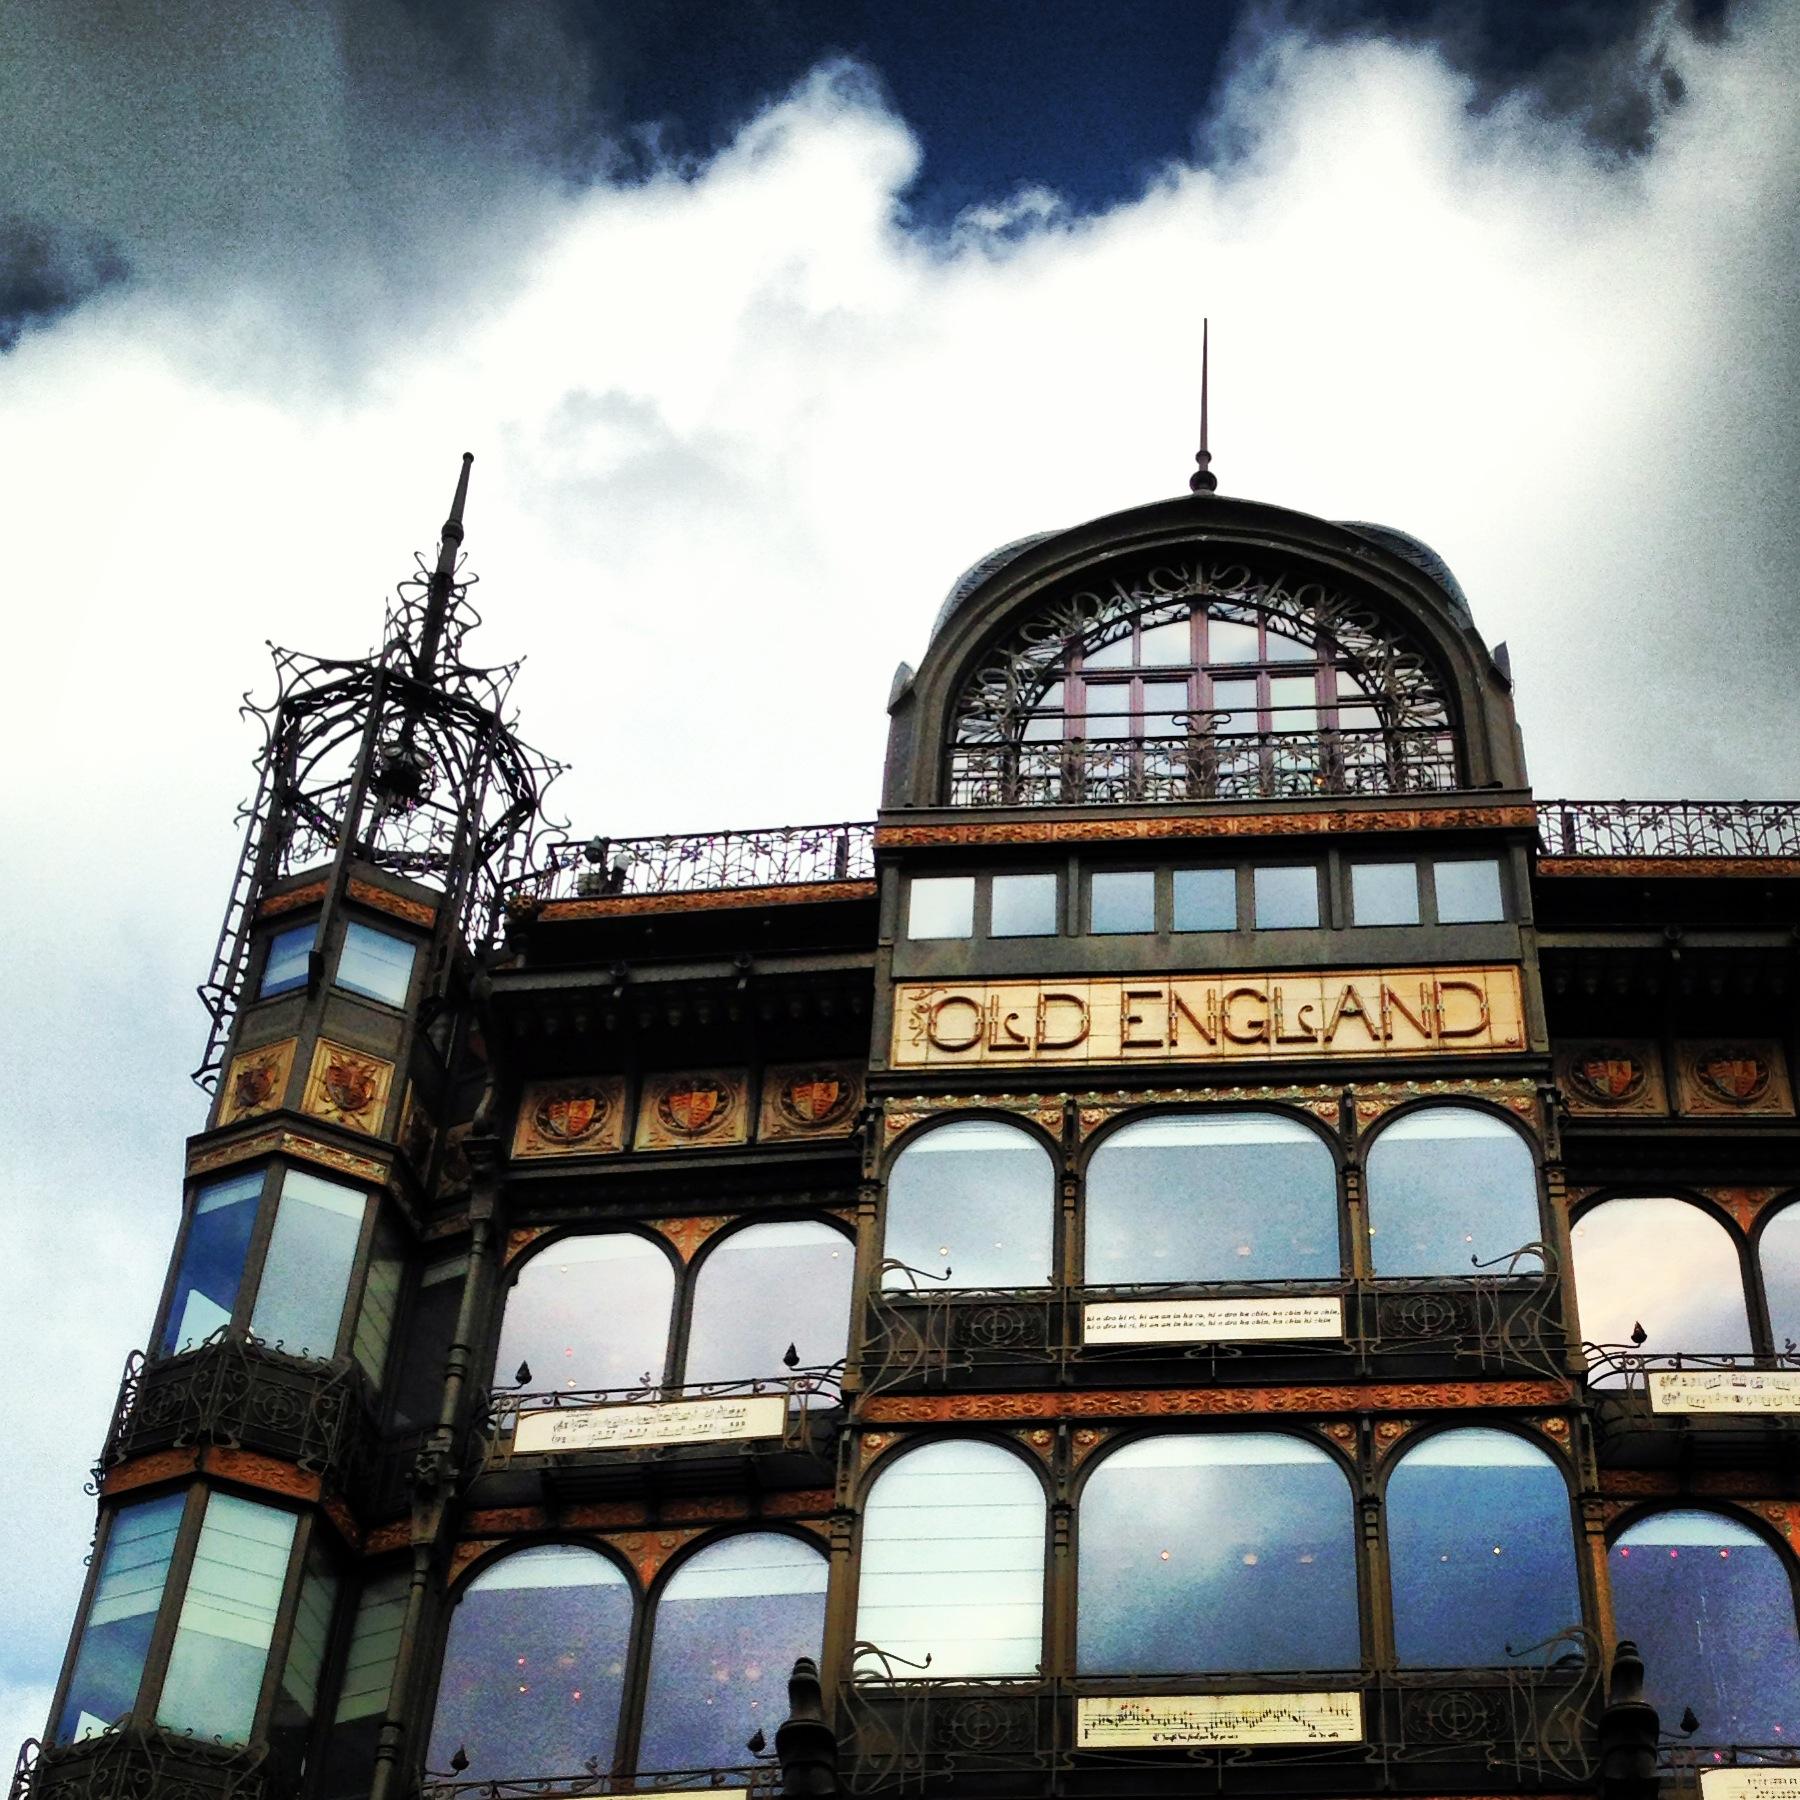 museo degli stumenti musicali, bruxelles, belgium